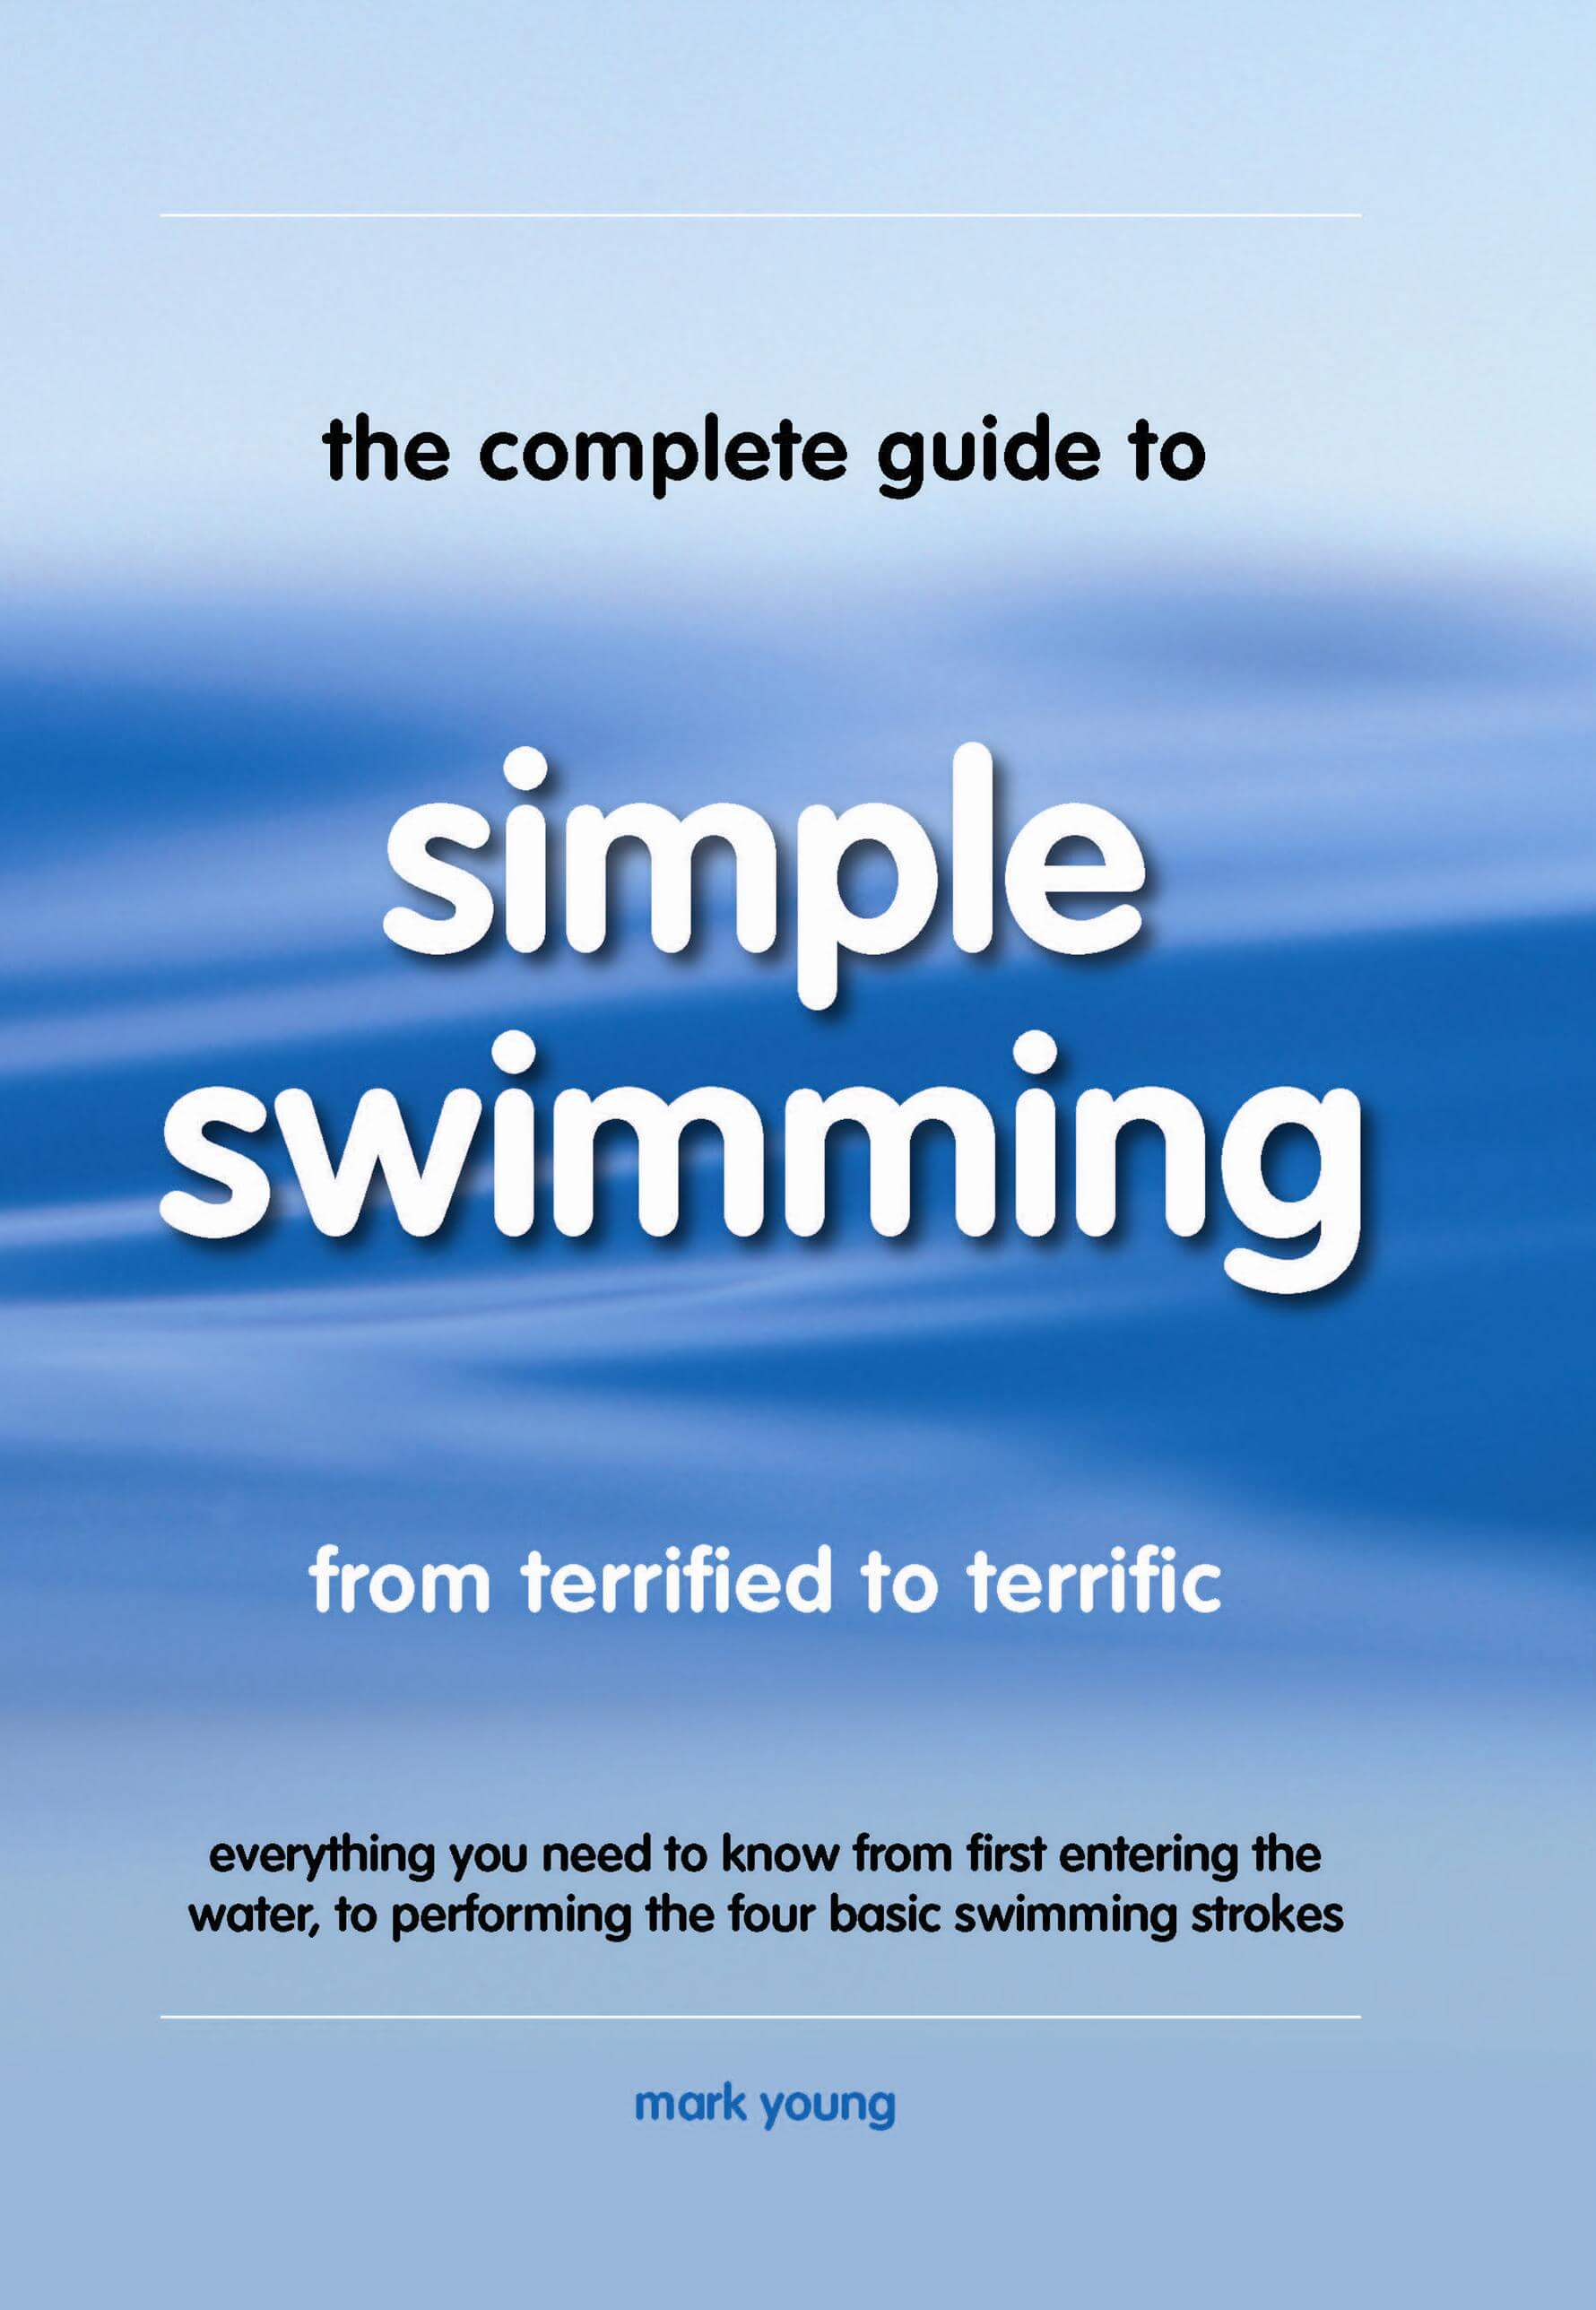 simple swimming technique